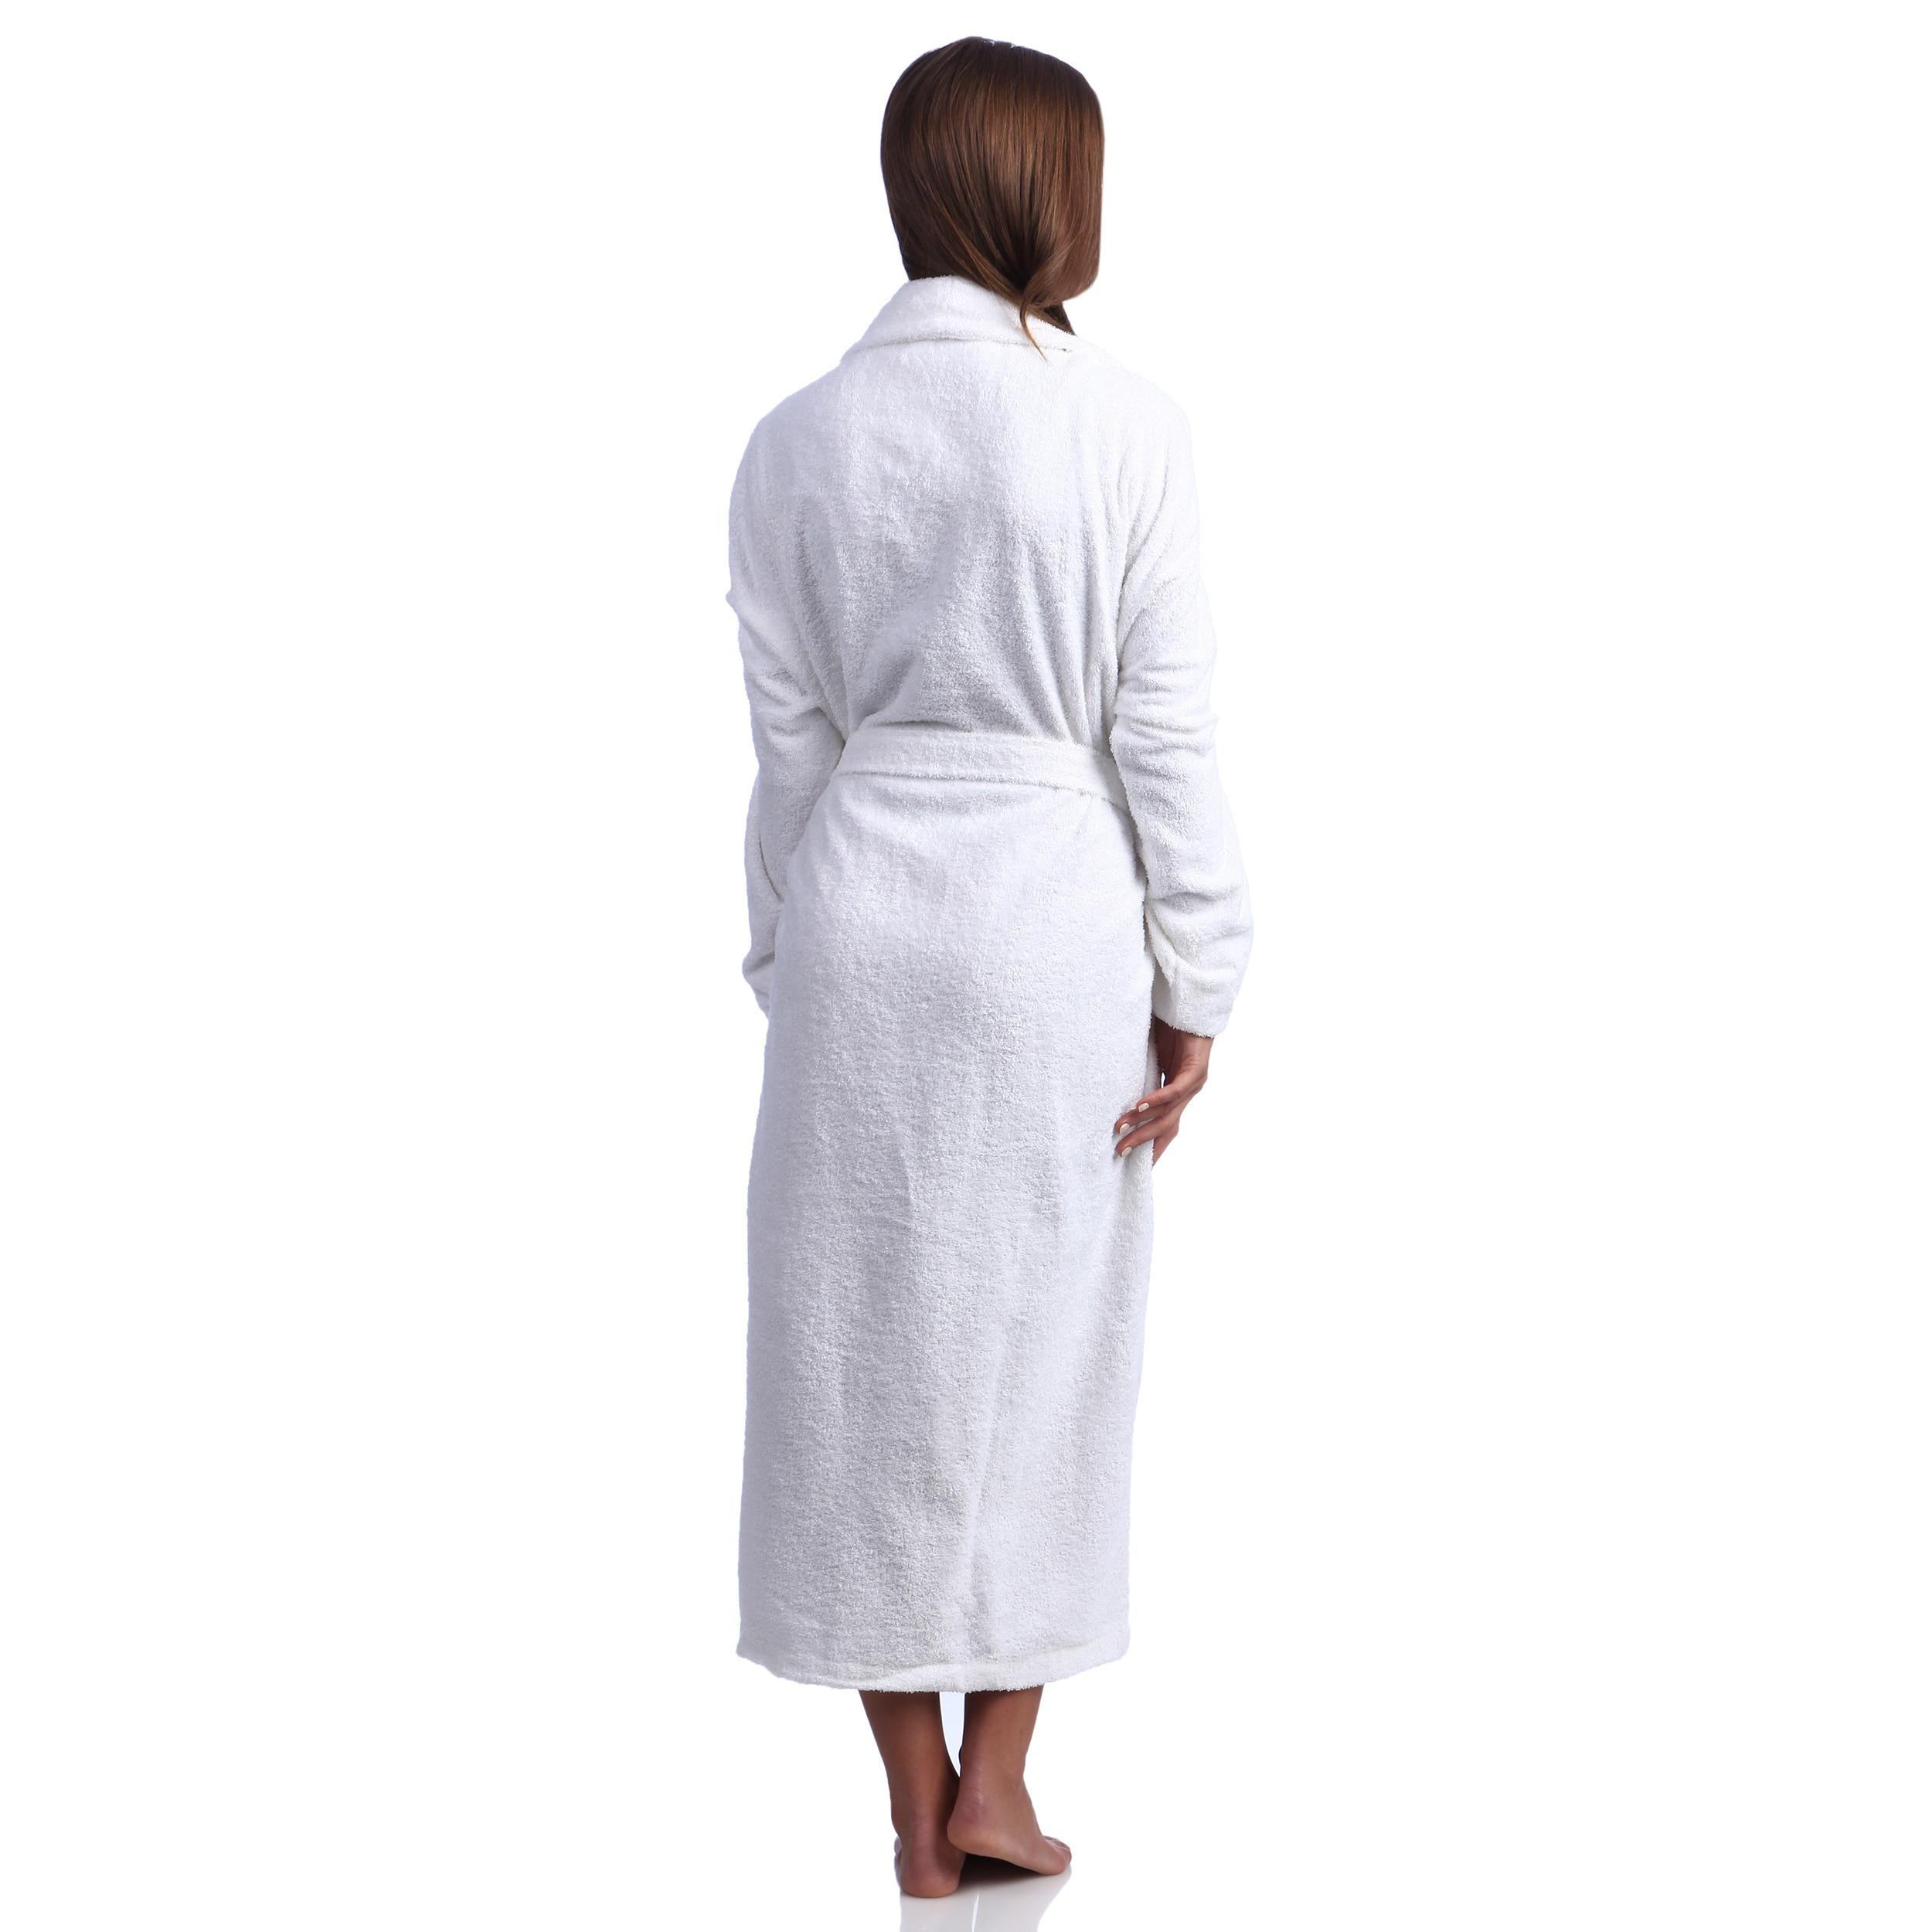 067b9d926b Shop Classic Turkish Towel Shawl Collar Cotton Terry Cloth Bath Robe - Free  Shipping Today - Overstock - 8358075